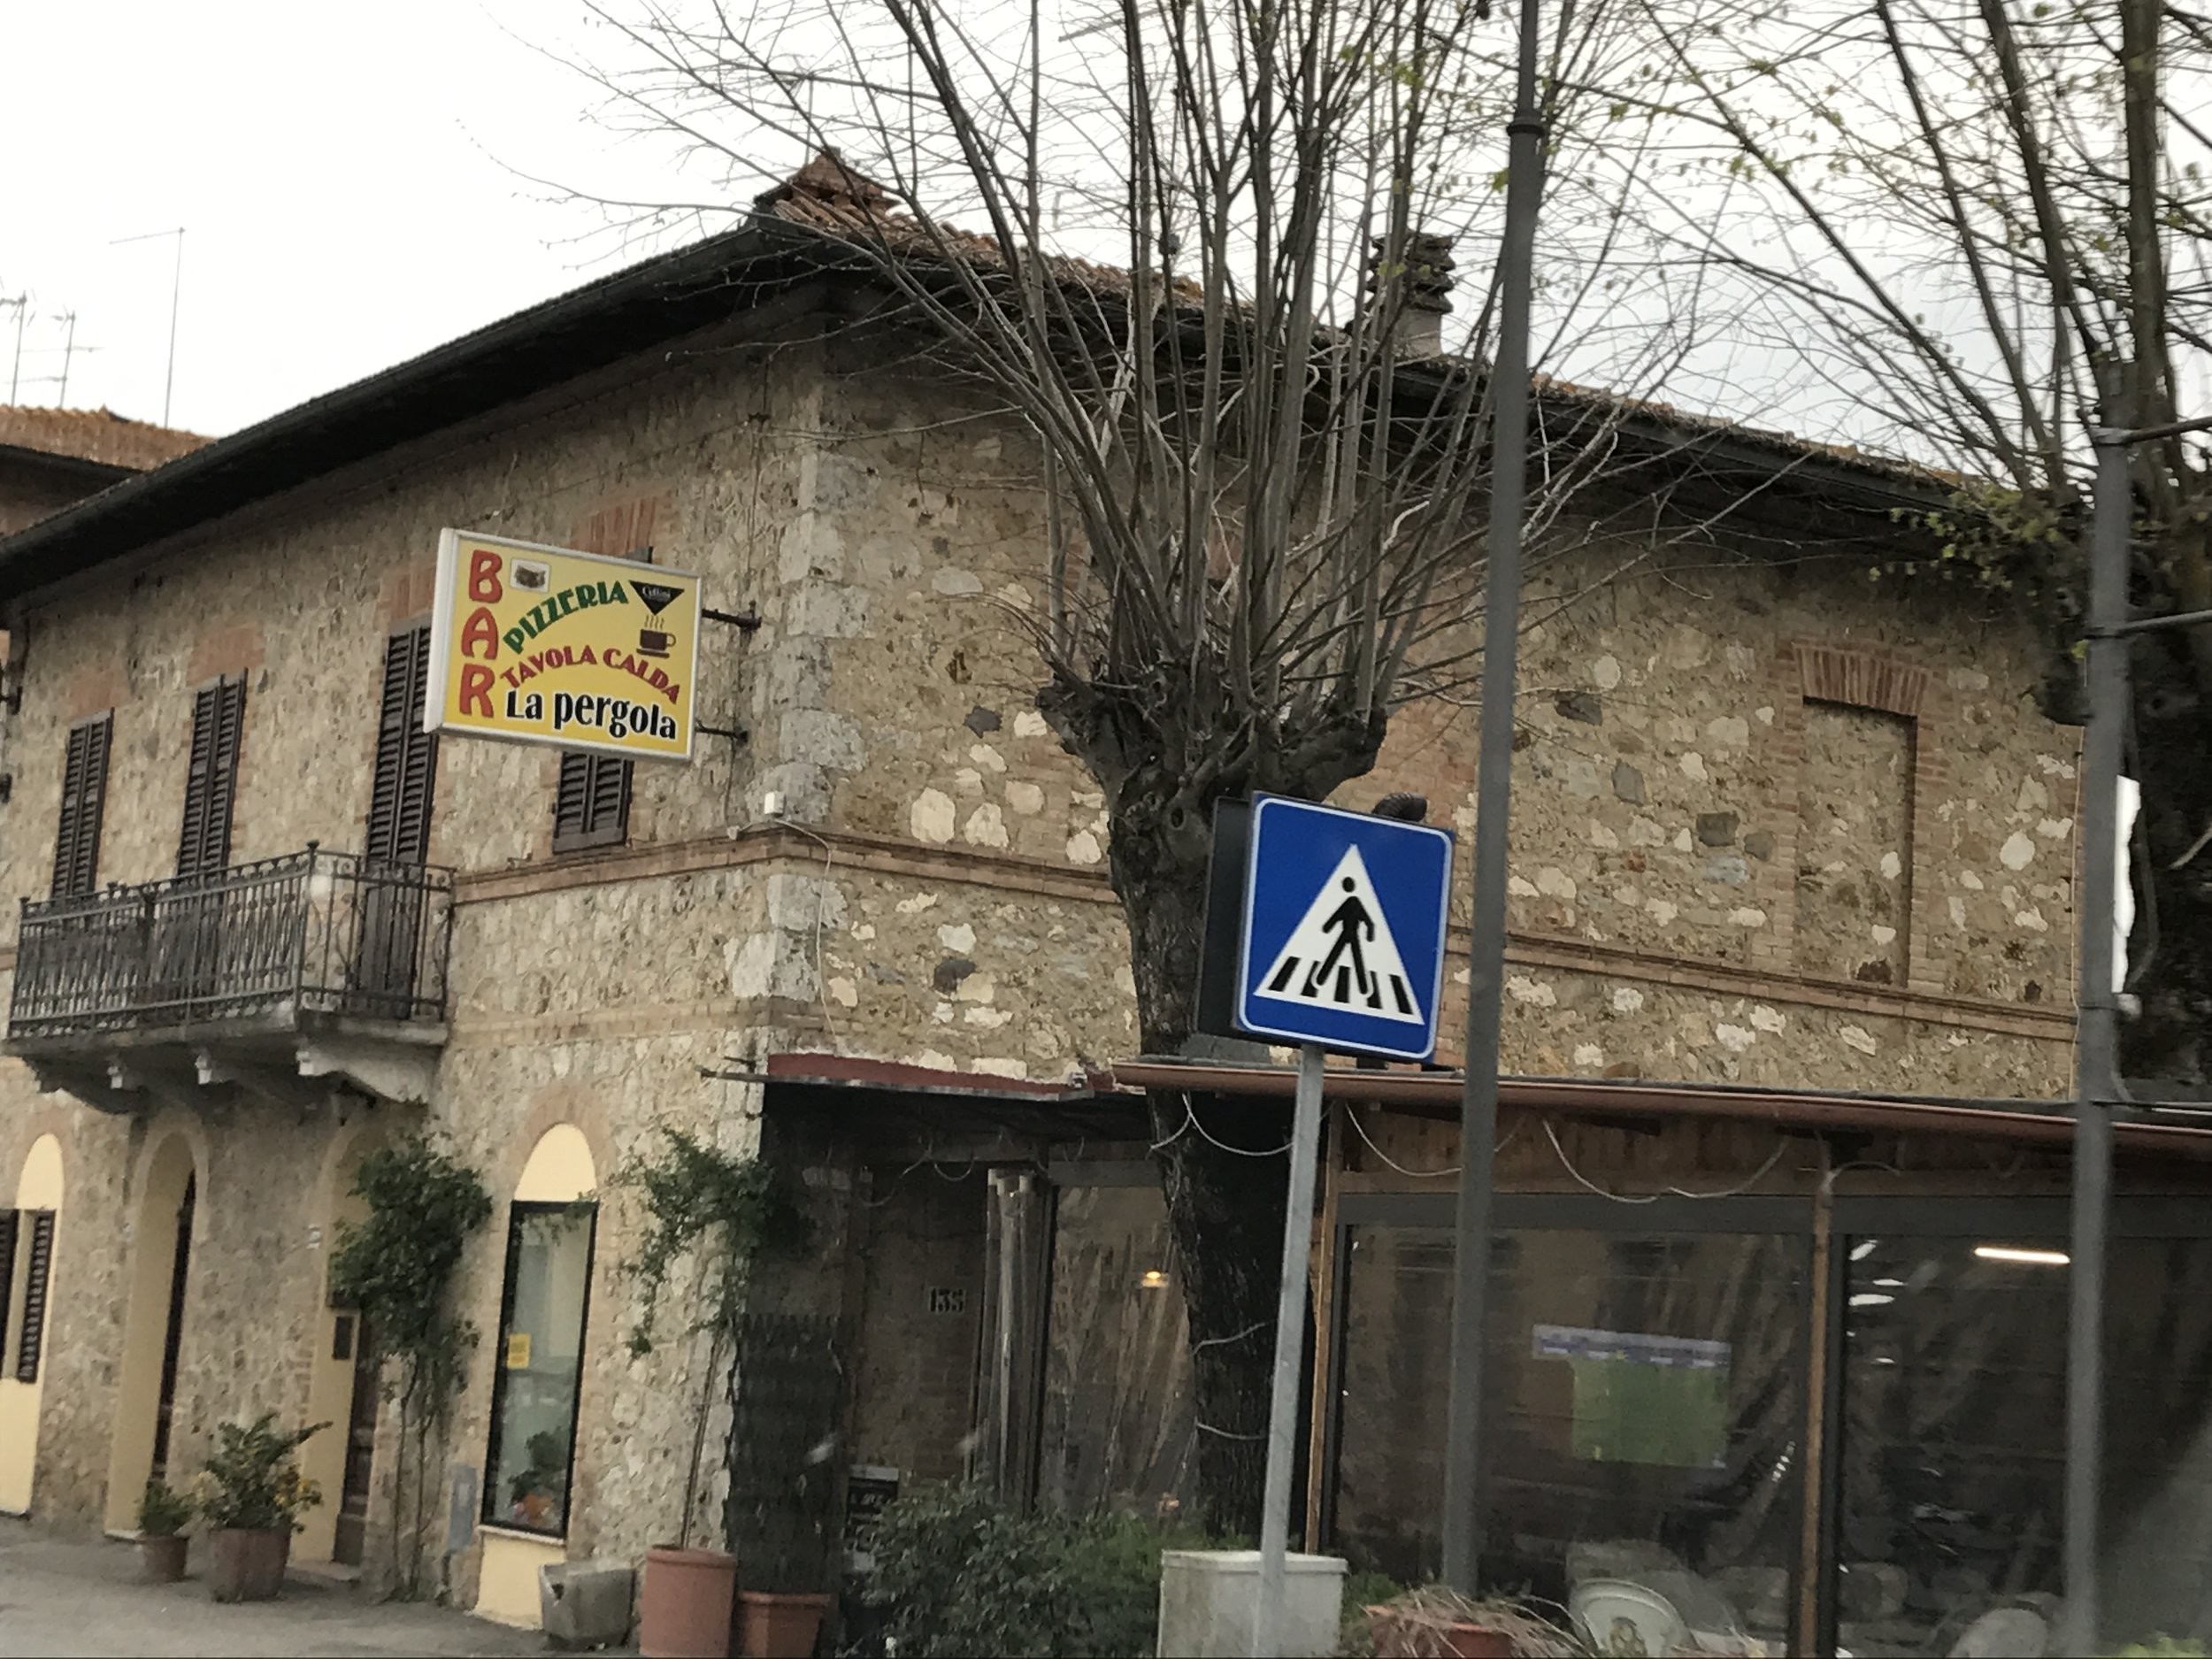 The Hot Table Pizzeria and Bar [Tavola Calda]